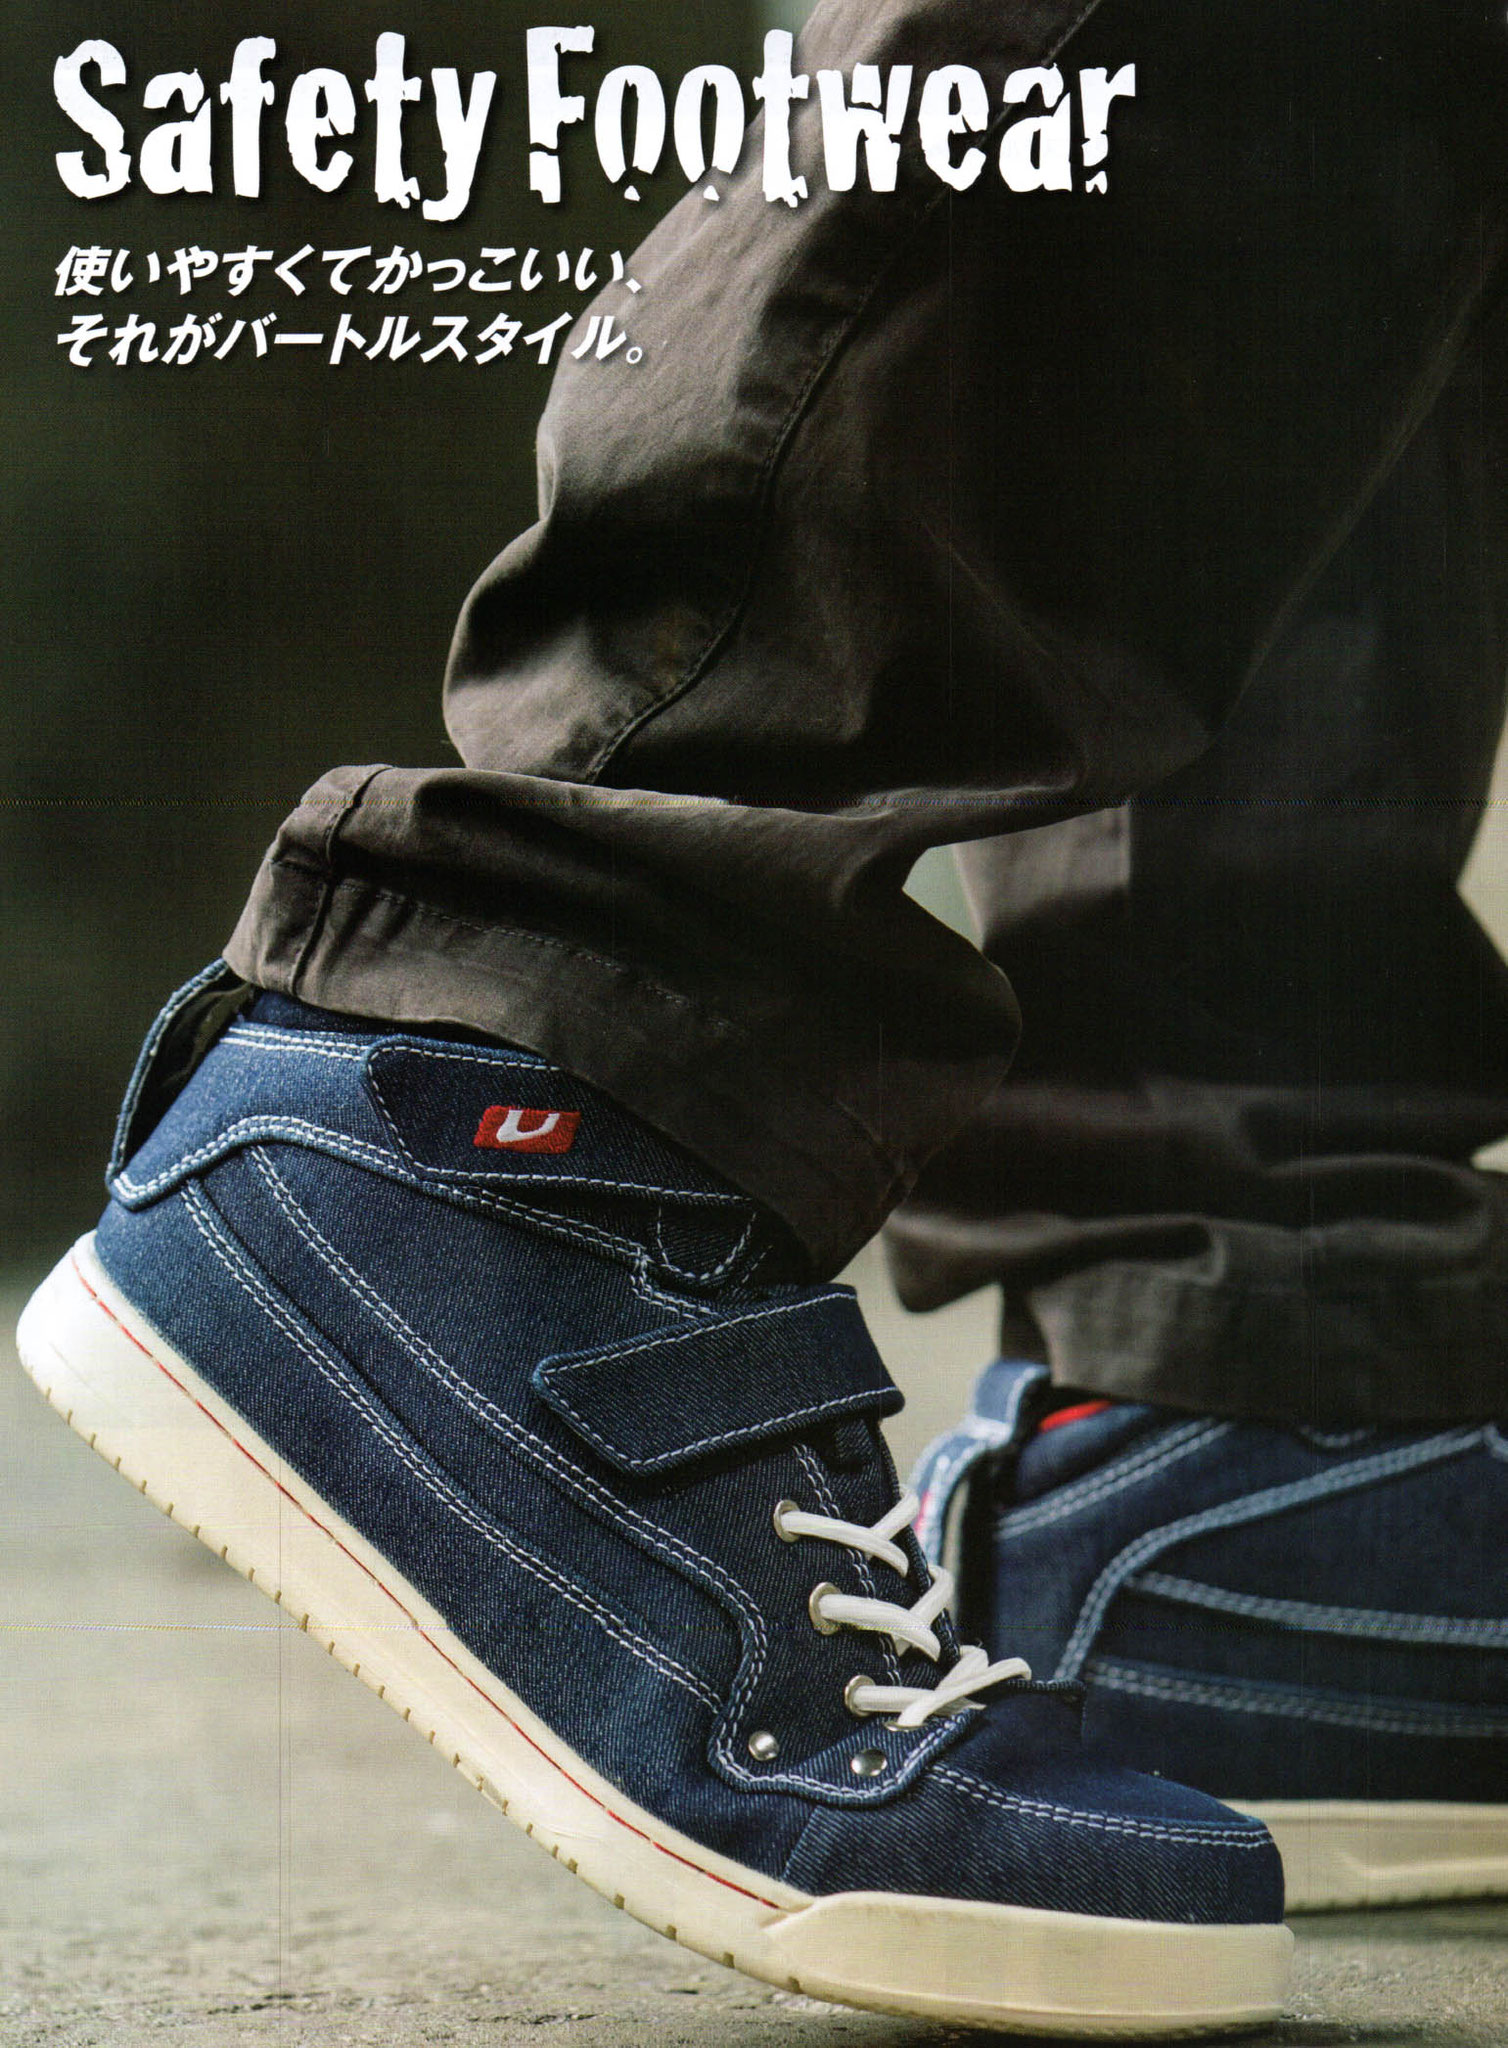 BURTLE 809 SAFETY FOOTWEAR 使いやすくてカッコイイ、それがバートルスタイル!!